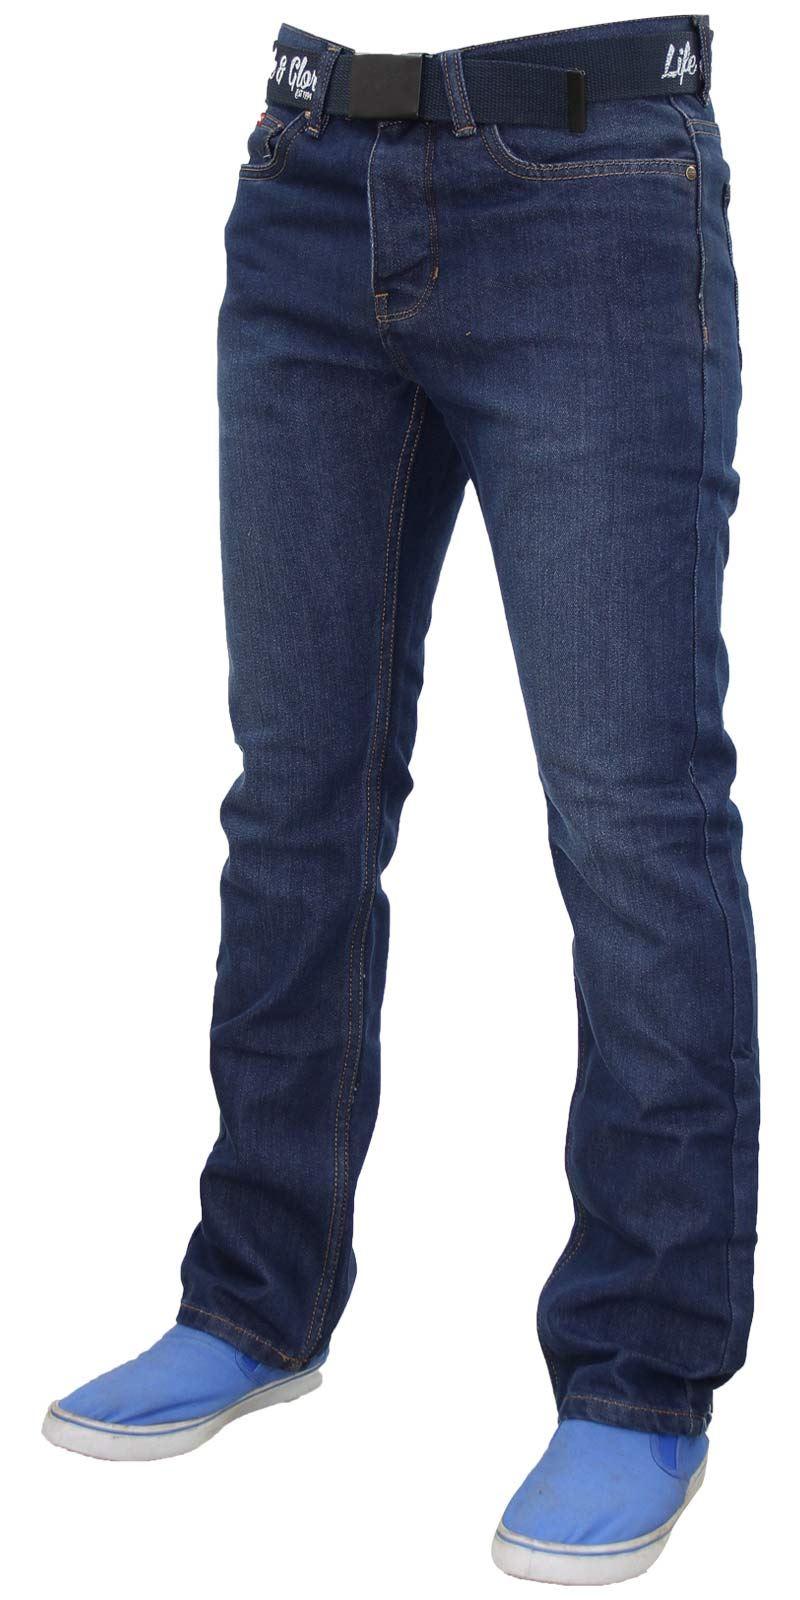 Mens-Regular-Fit-Jeans-Straight-Leg-Denim-Pants-Casual-Trousers-With-Free-Belt thumbnail 9